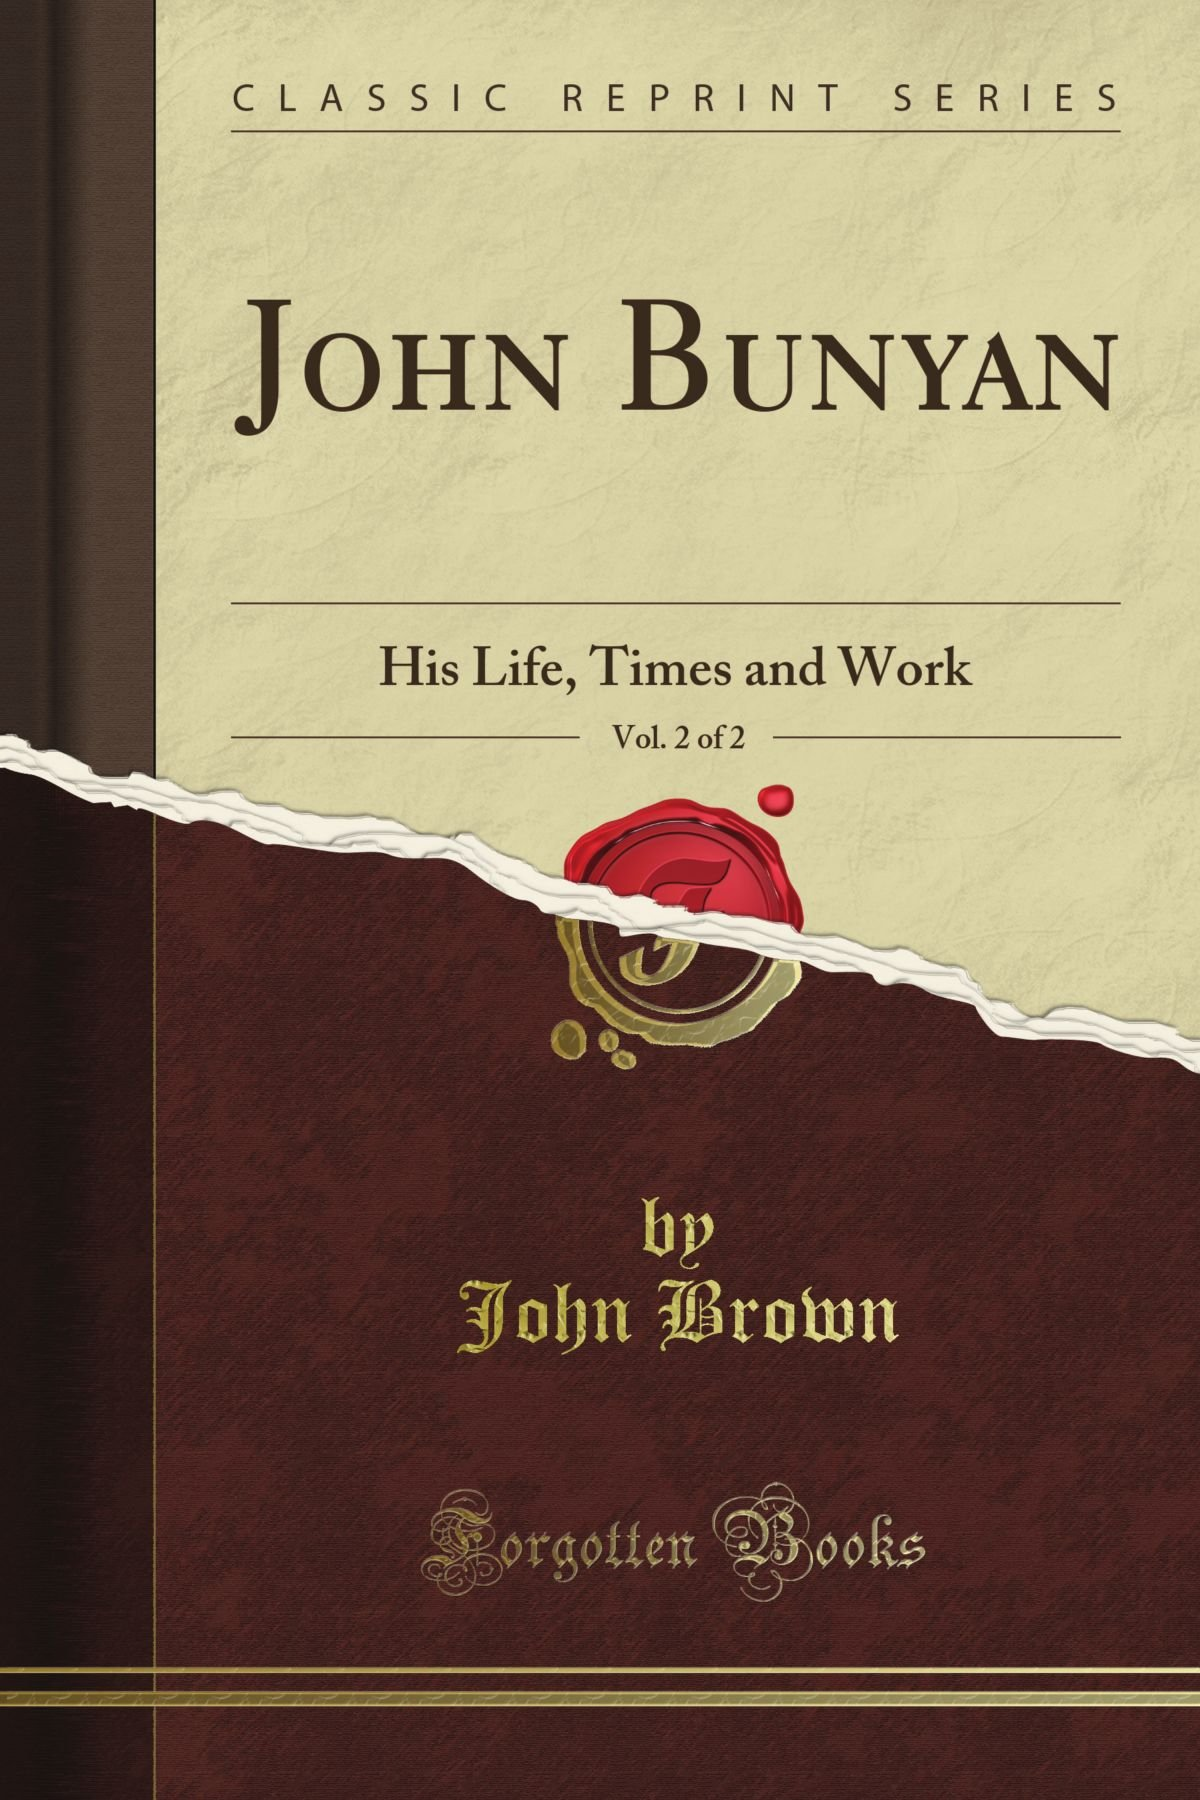 John Bunyan: His Life, Times and Work, Vol. 2 of 2 (Classic Reprint)